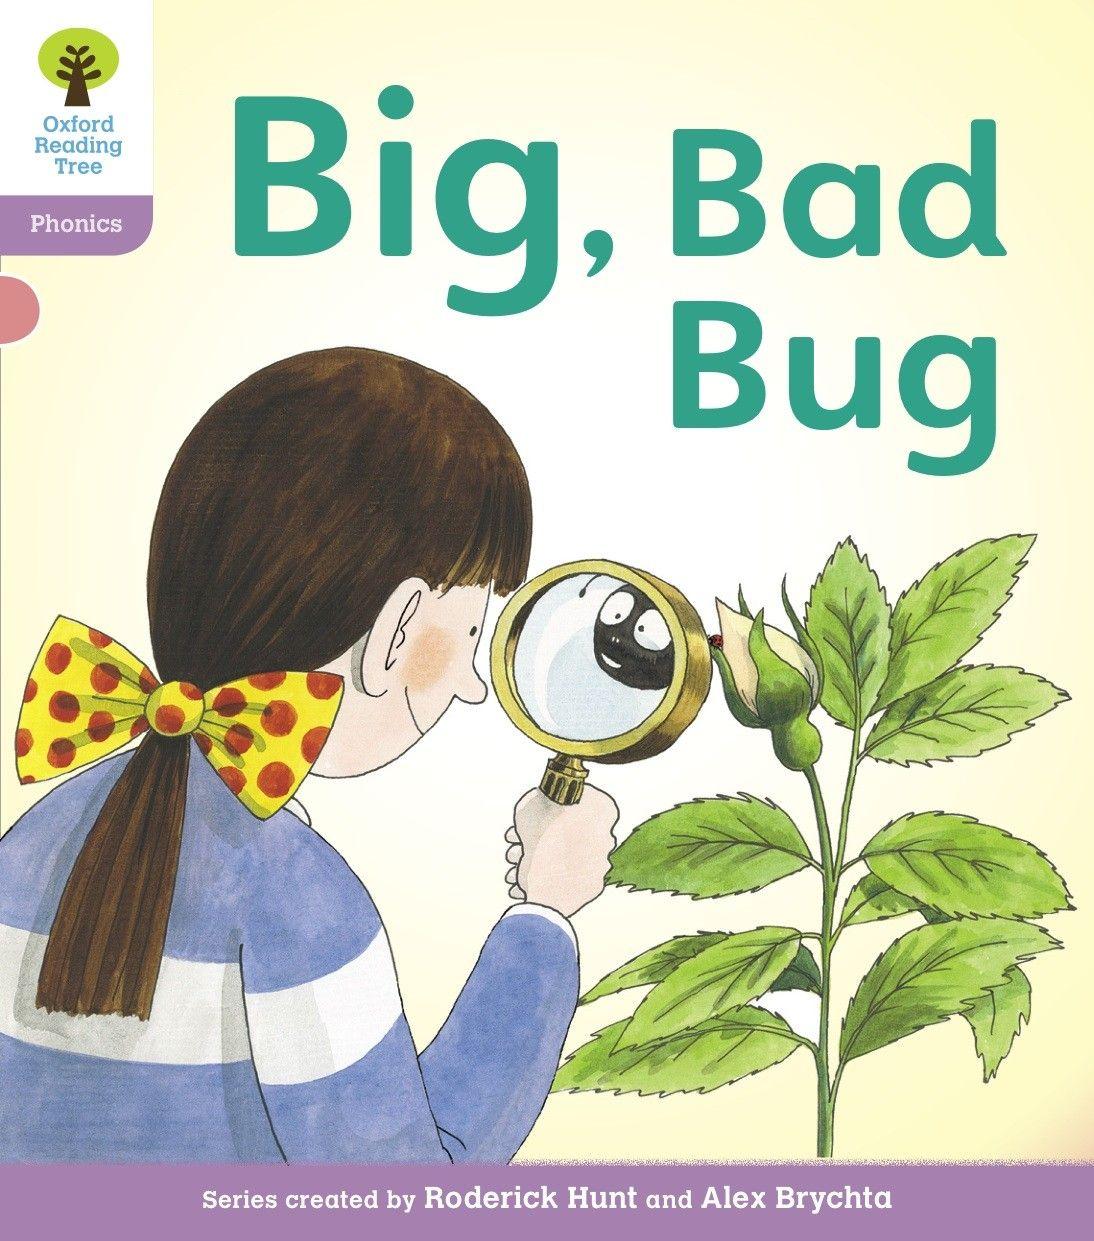 Big Bad Bug Oxford Reading Tree Reading Tree Phonics Reading [ 1241 x 1094 Pixel ]